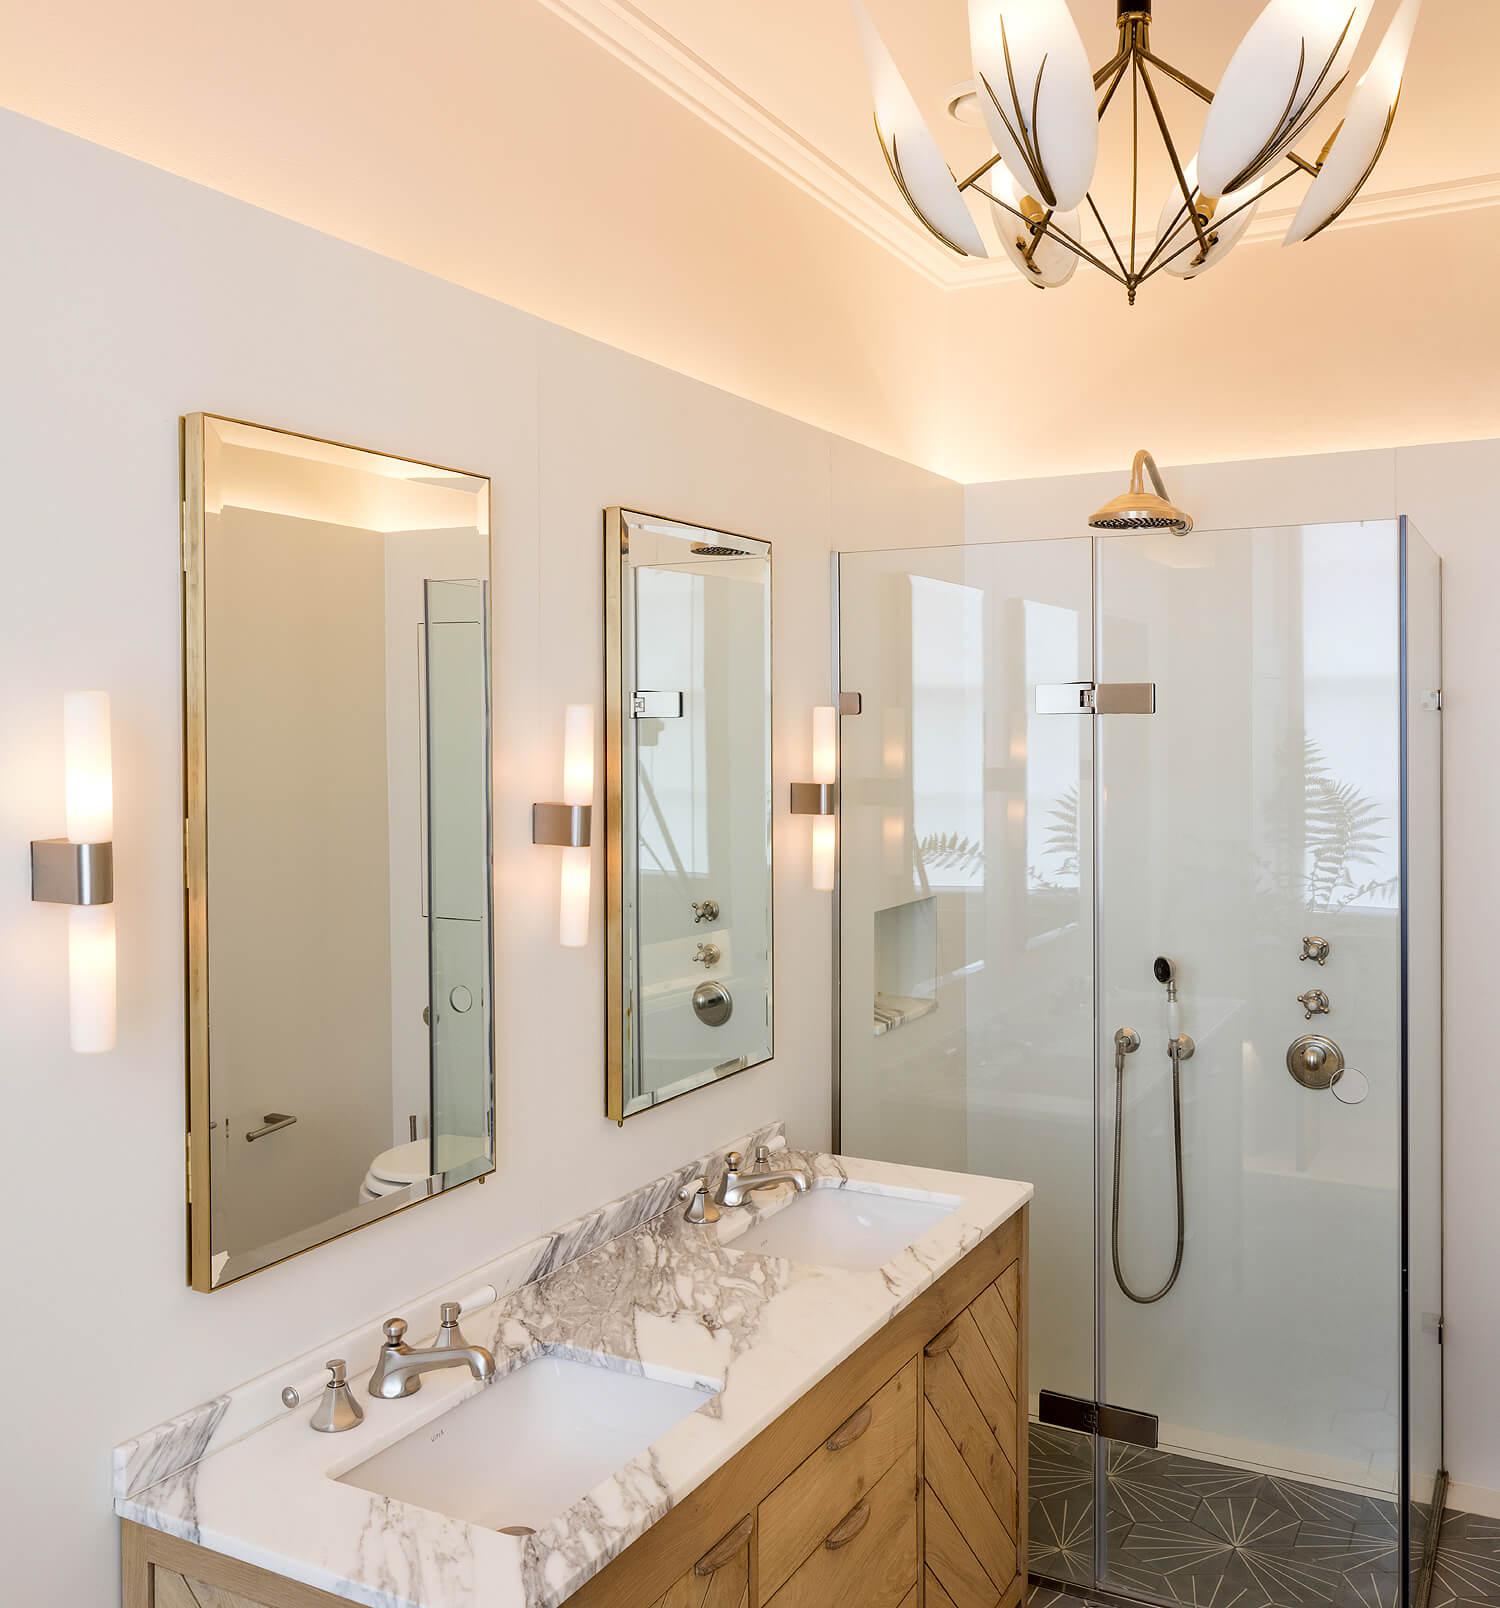 Emily Bizley Interior Design London House ensuite